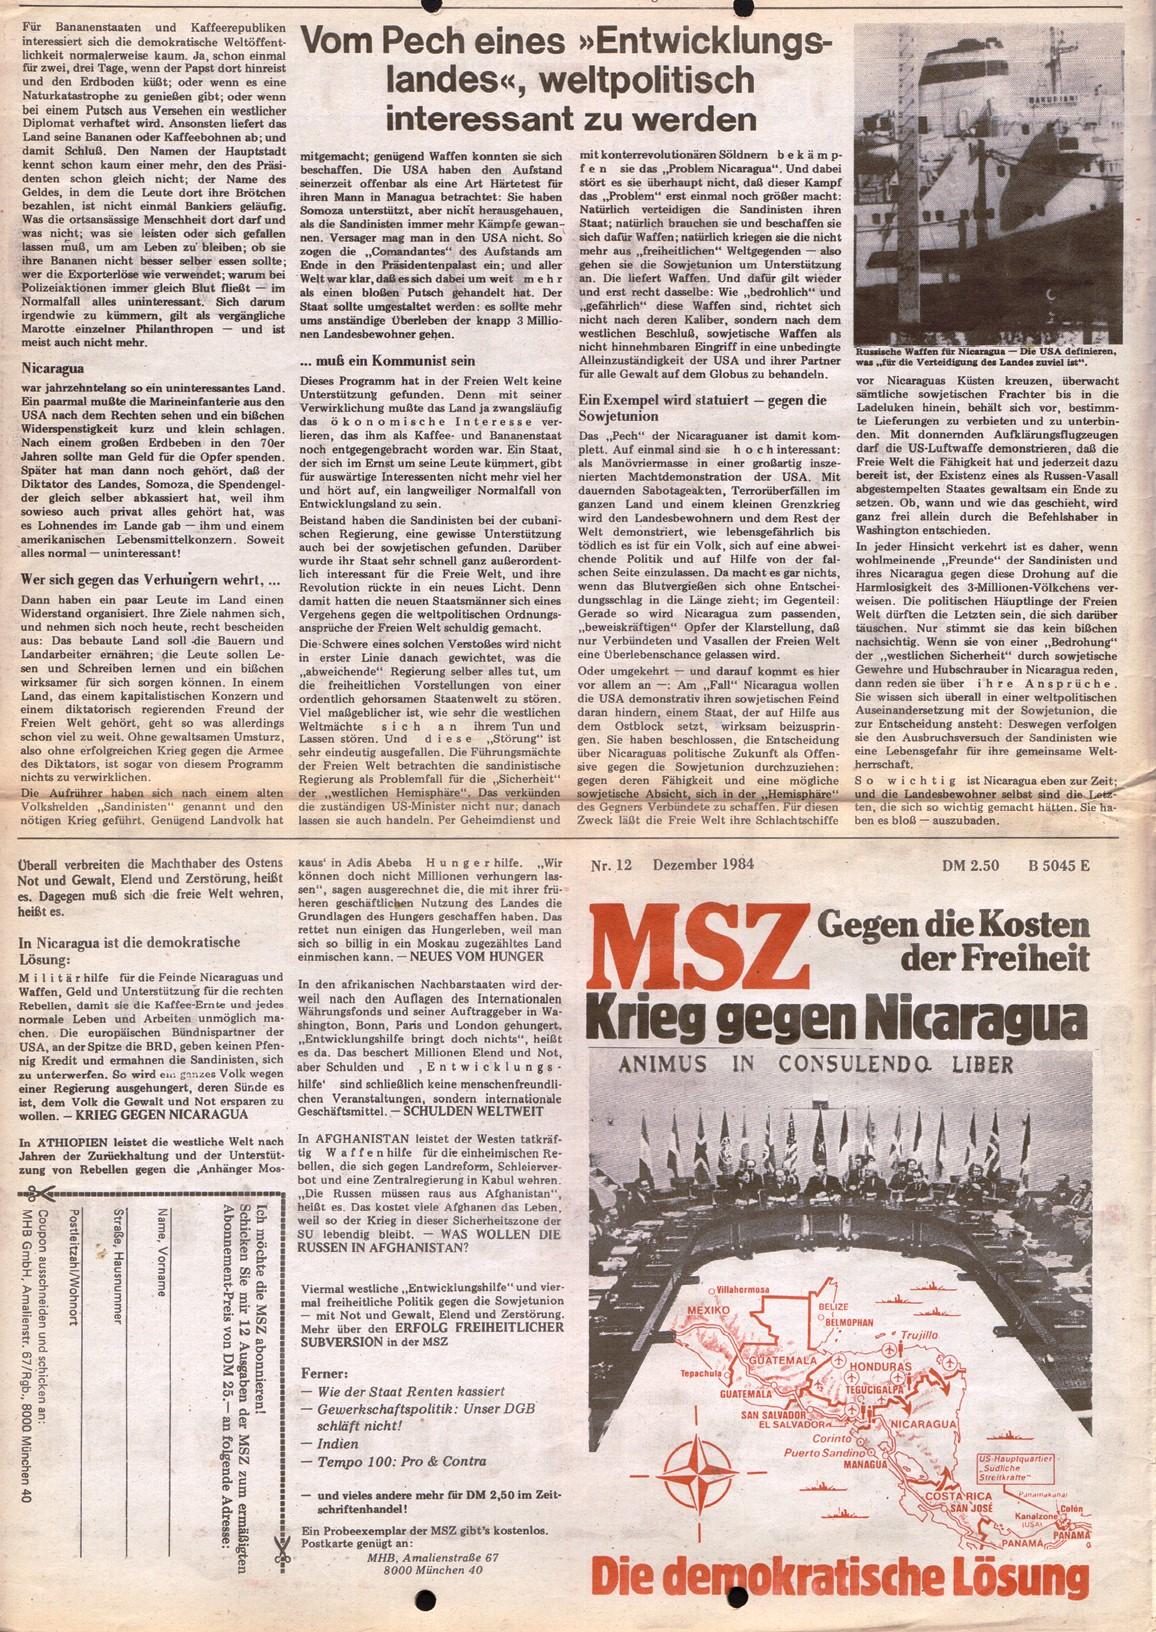 Muenchen_MG_MAZ_BMW_19841205_04